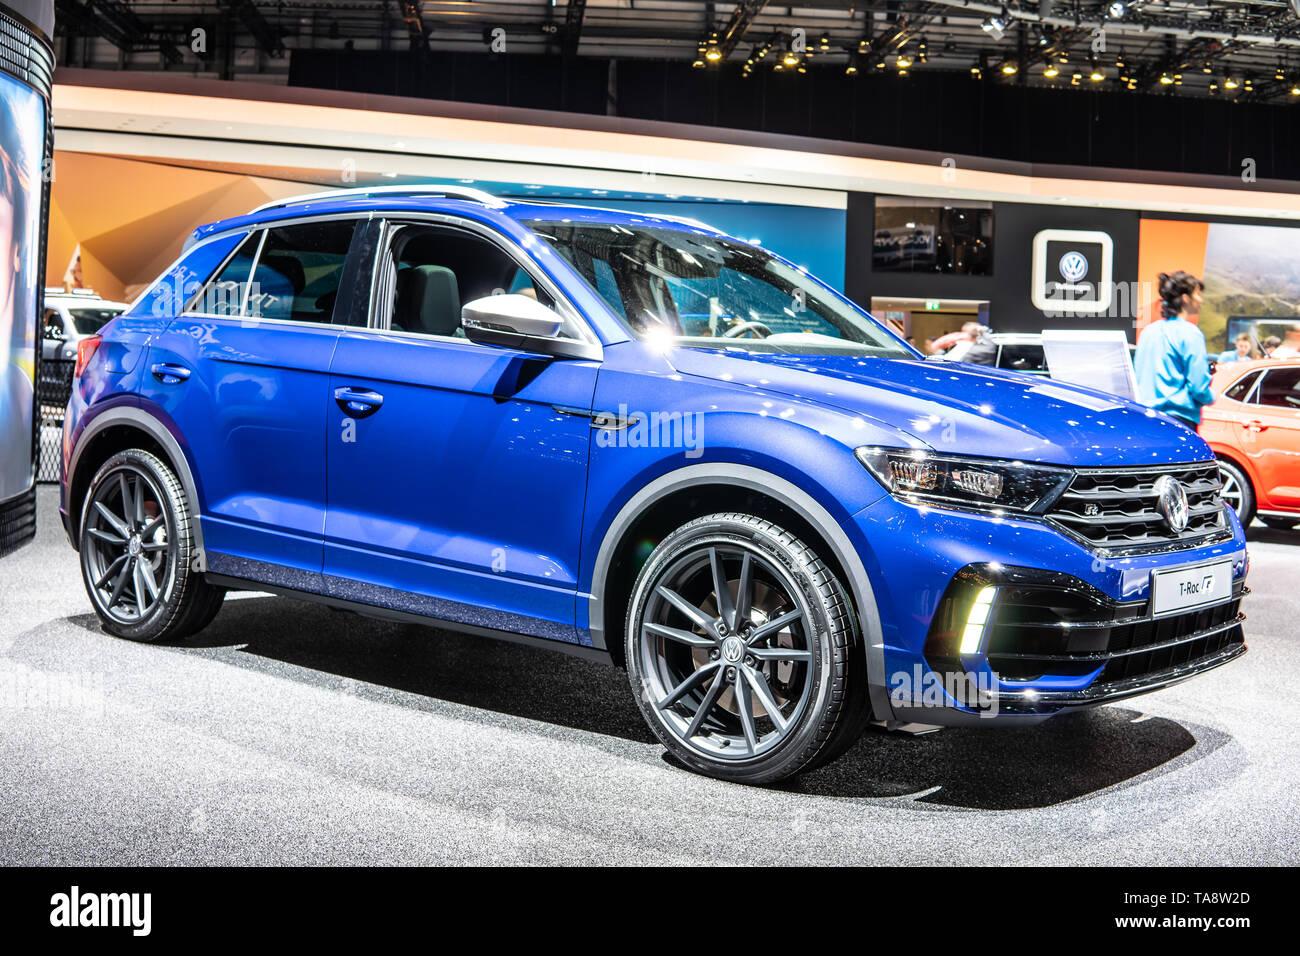 Geneva, Switzerland, March 05, 2019: metallic blue high-performance Volkswagen VW T-Roc R at Geneva International Motor Show, produced by Volkswagen - Stock Image